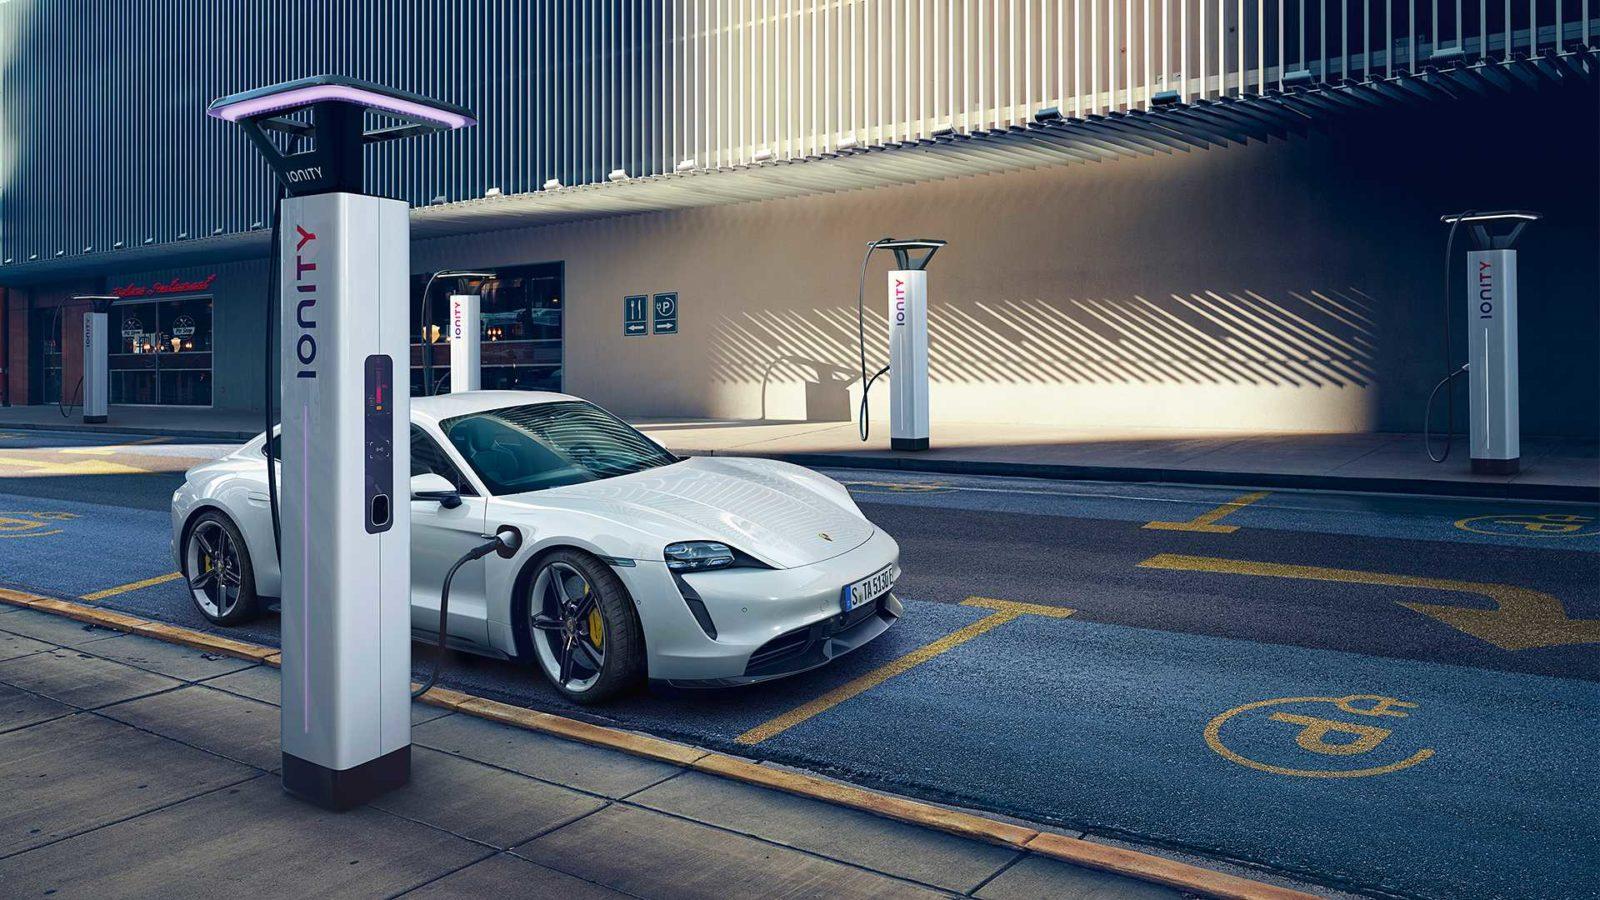 Porsche Releases All-Electric Super Sedan